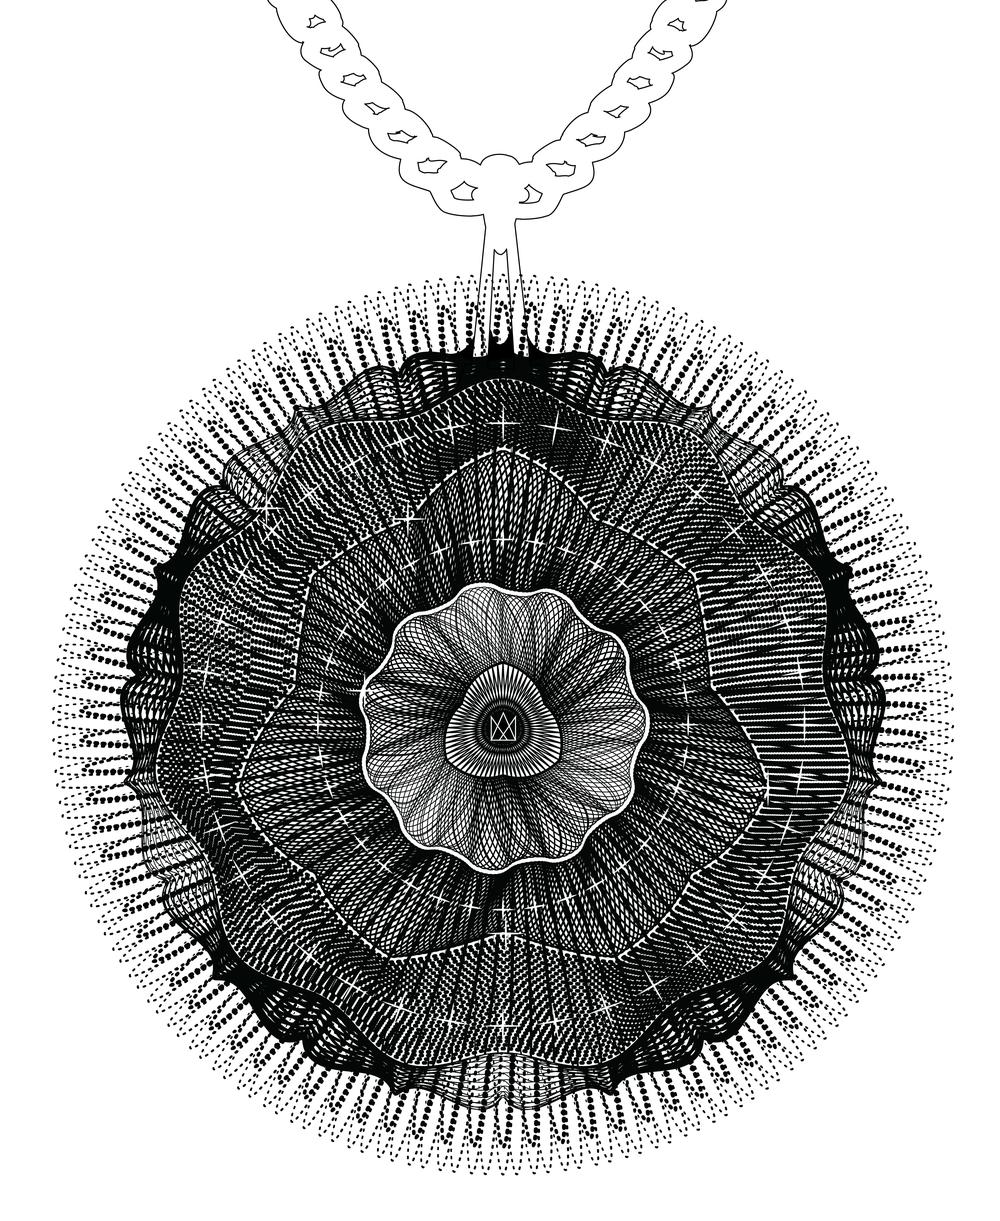 spirobling1508-illustrator.jpg